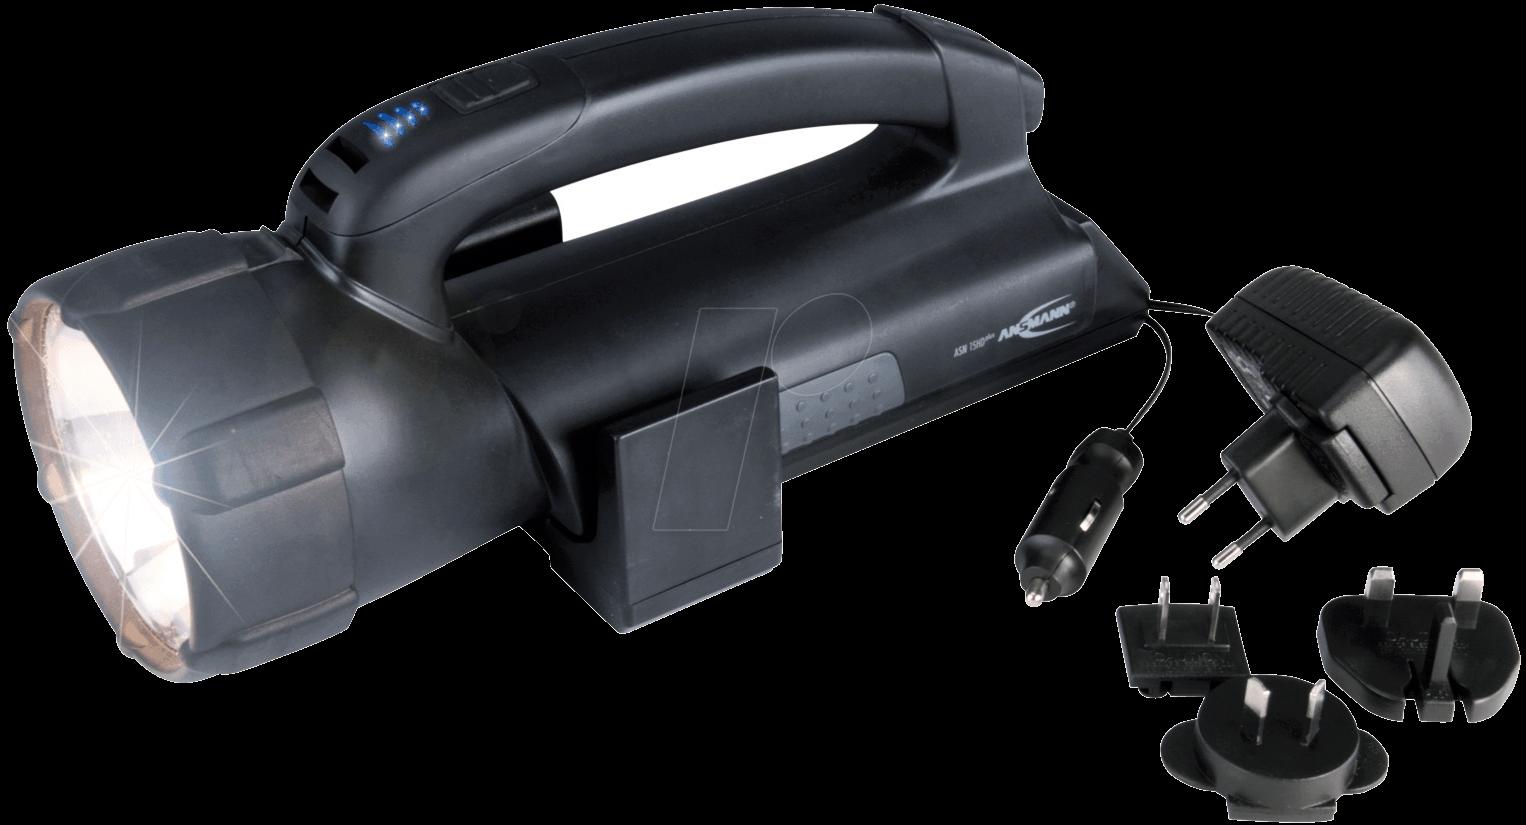 ASN 15 HD - Halogen-Handlampe 15HD Plus, 550 lm, schwarz, 3000 mA Akku